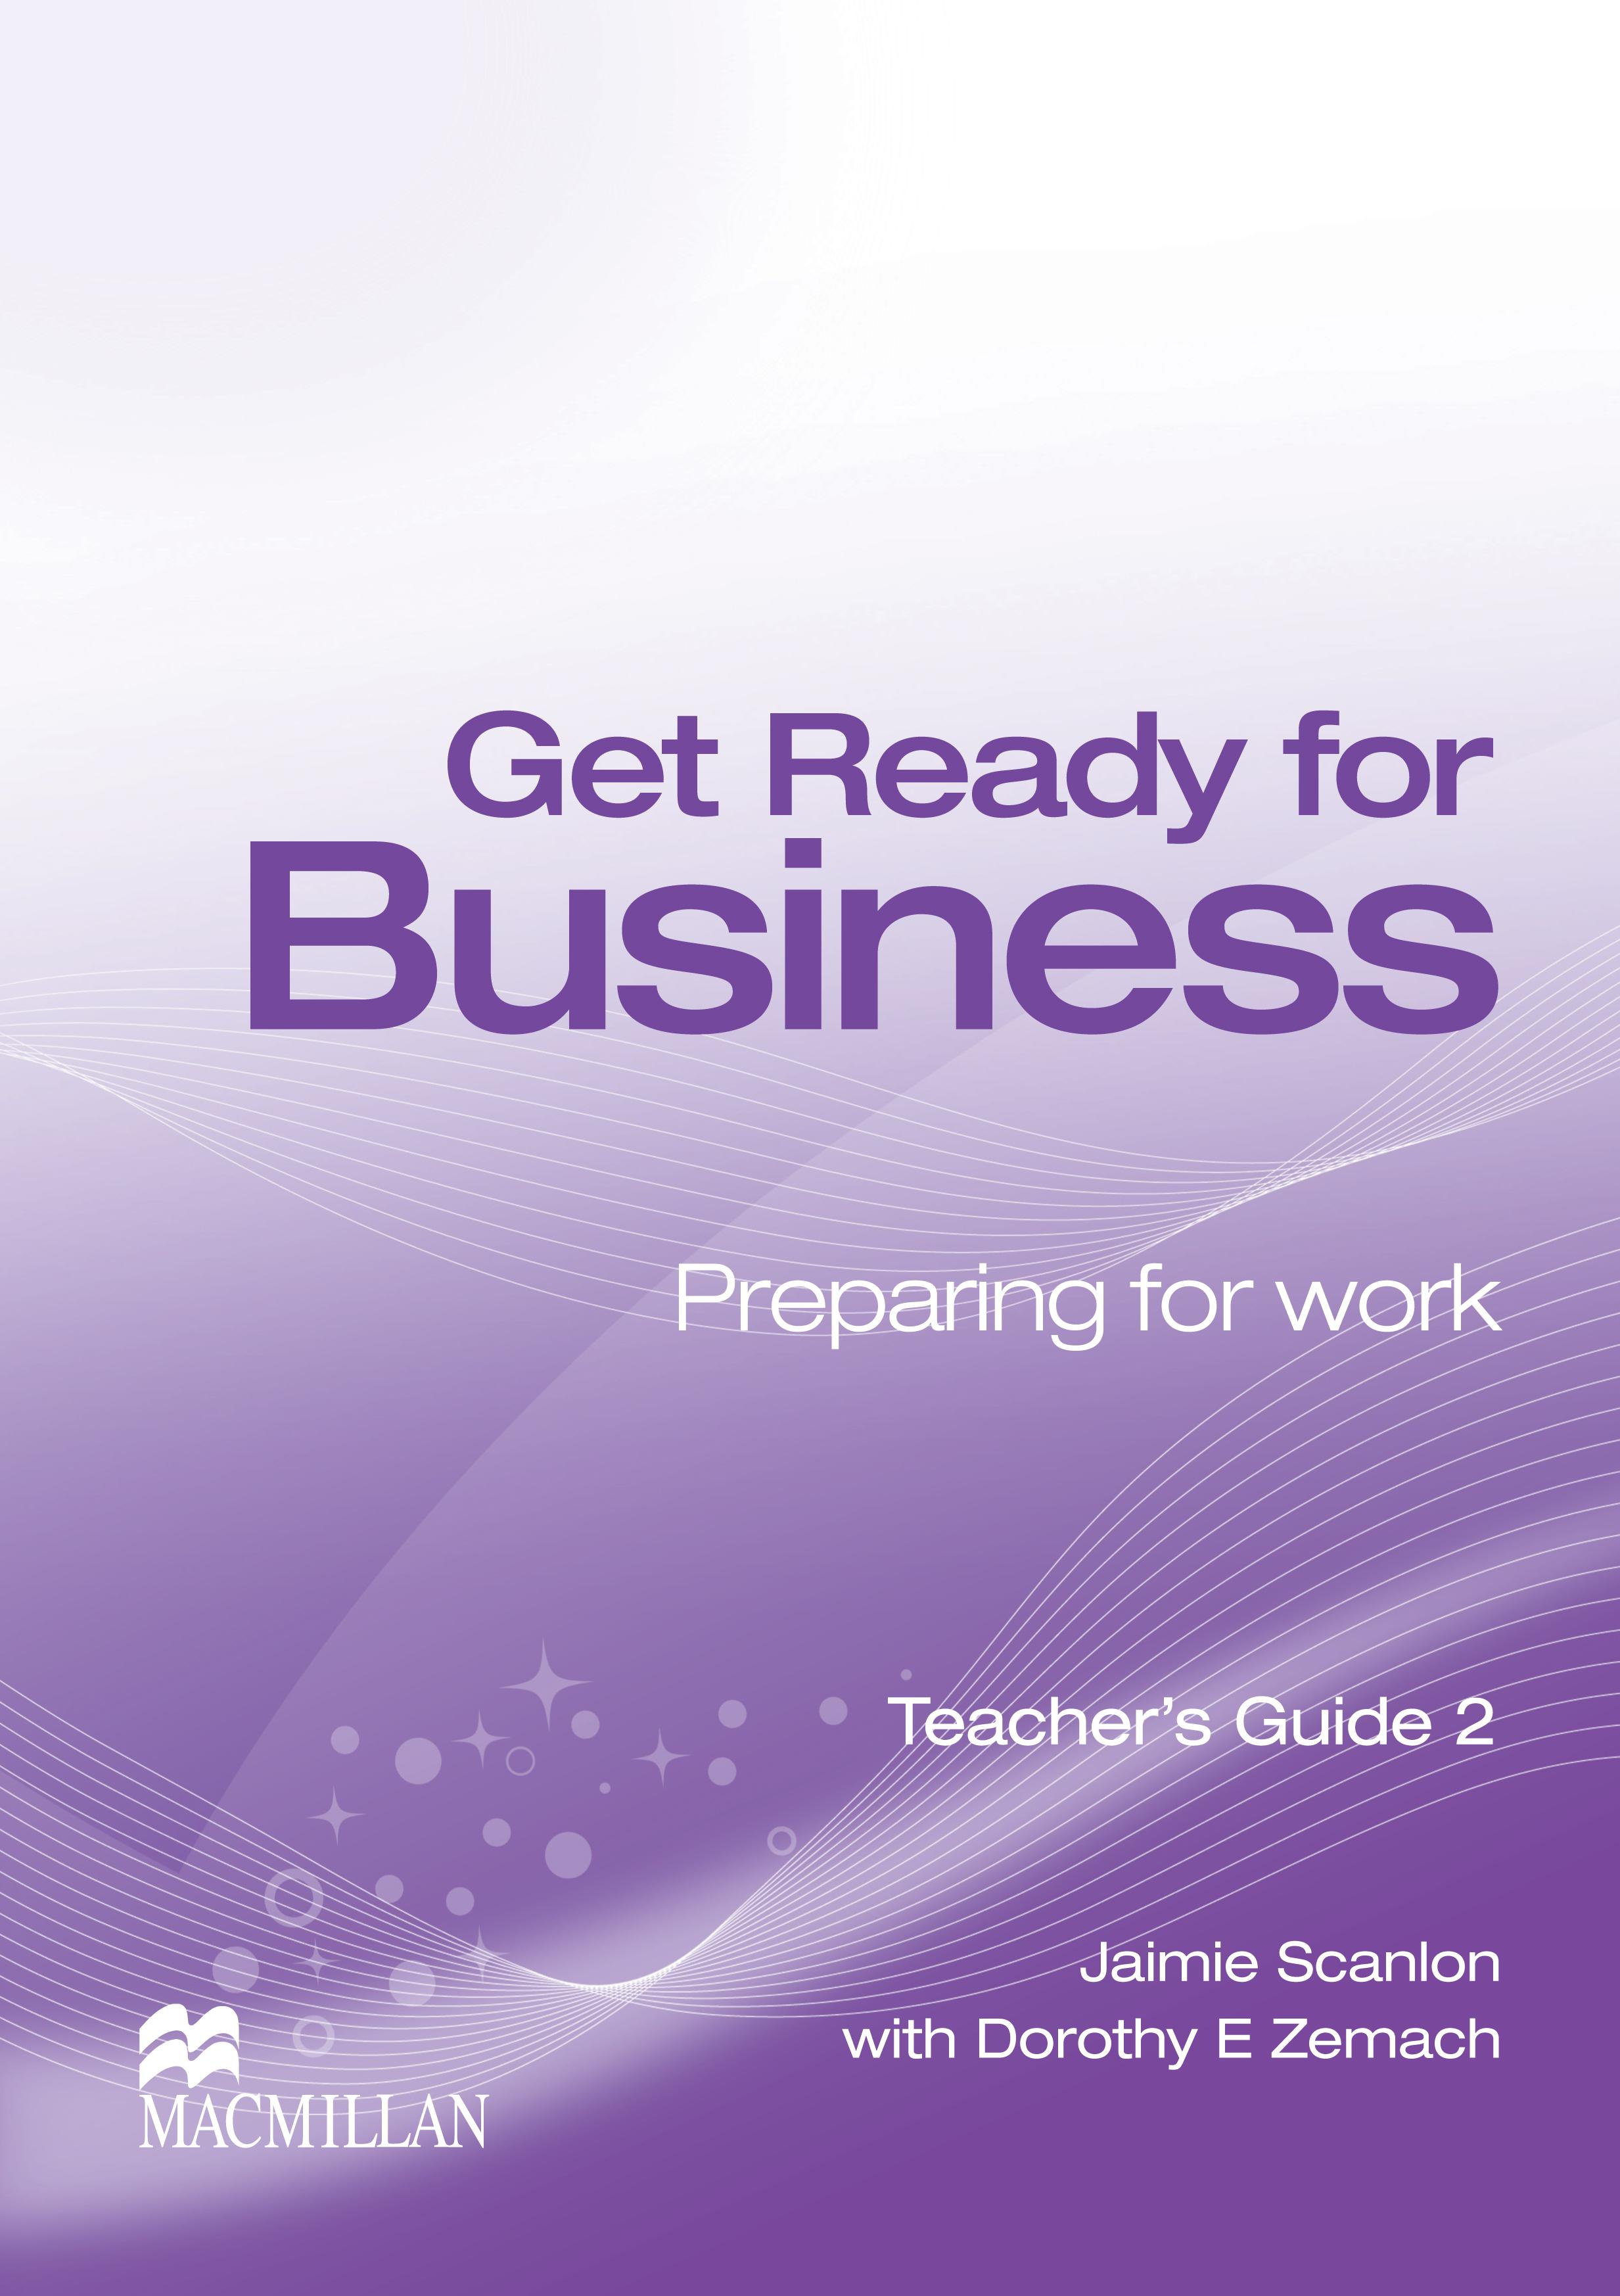 Get Ready for Business 2 Teacher